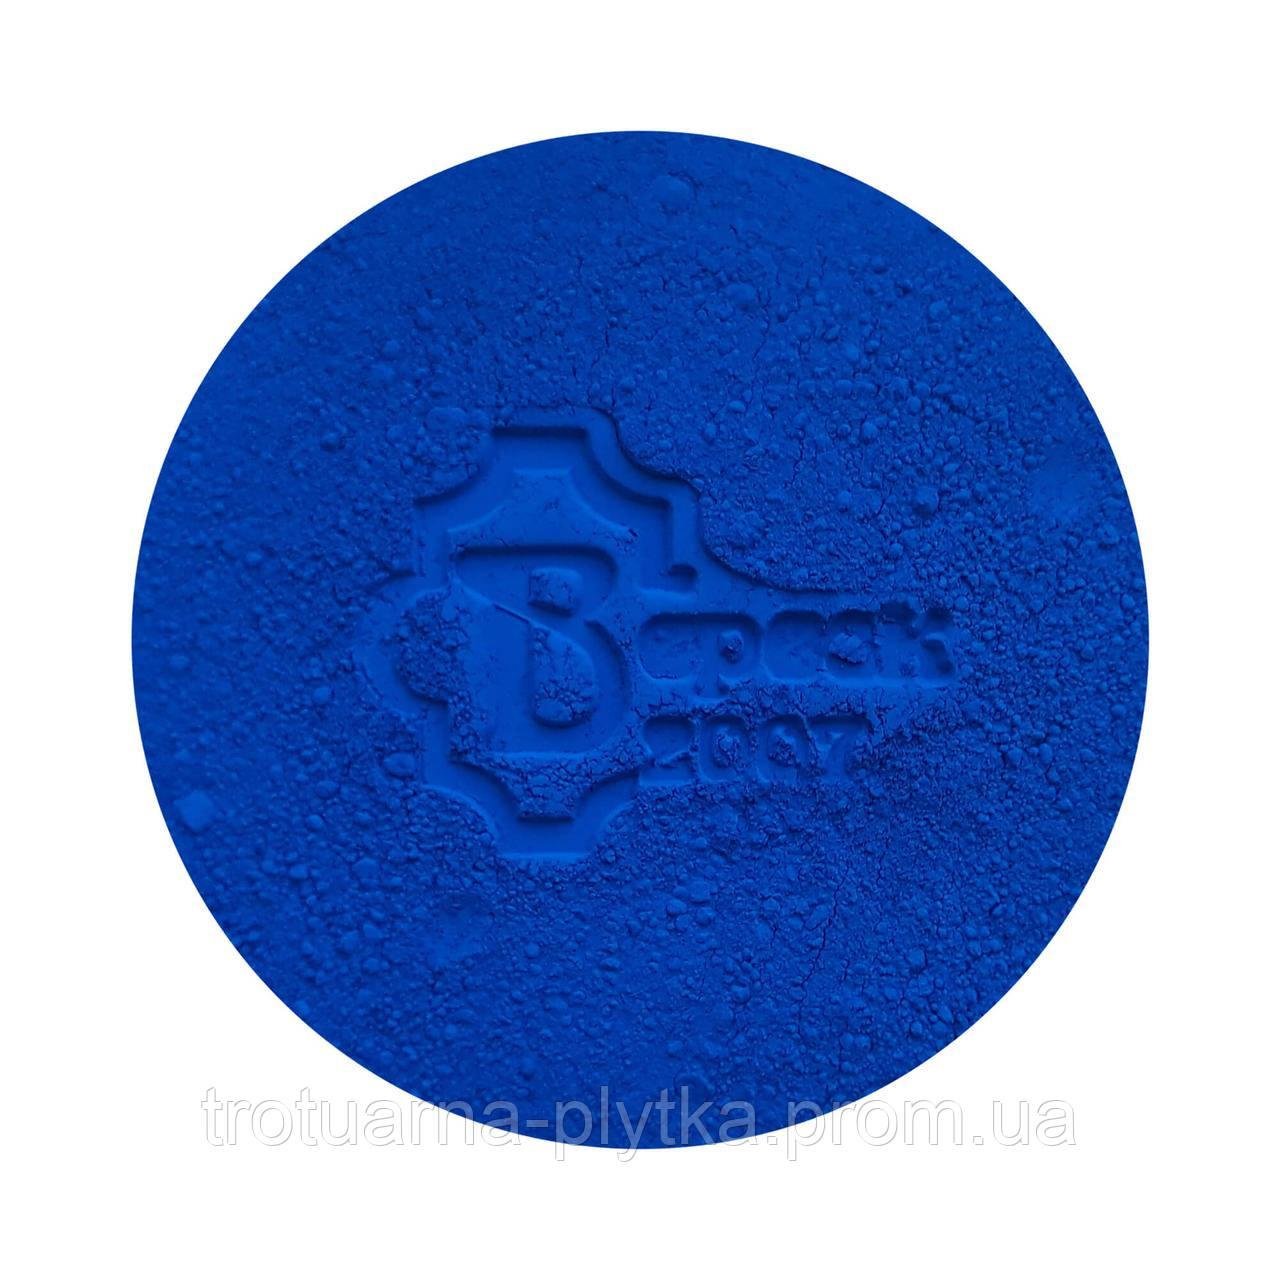 Купить синий пигмент для бетона коробка по бетону